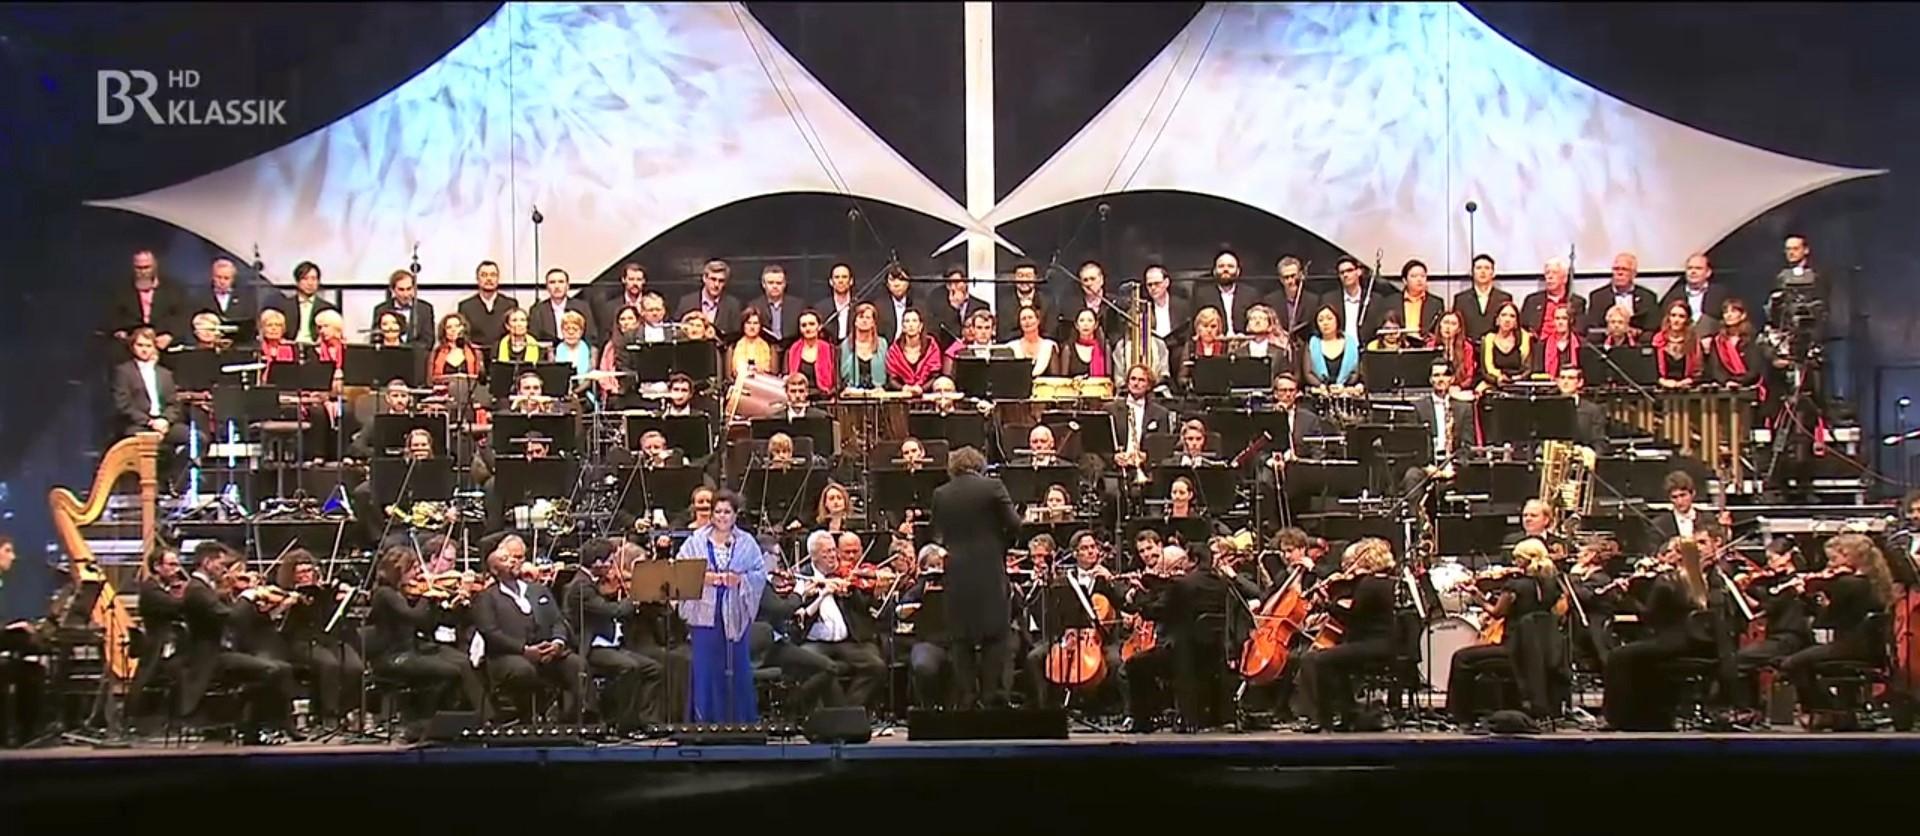 2018 Cooperation mit den Nürnberger Philharmonikern bei Klassik im Park